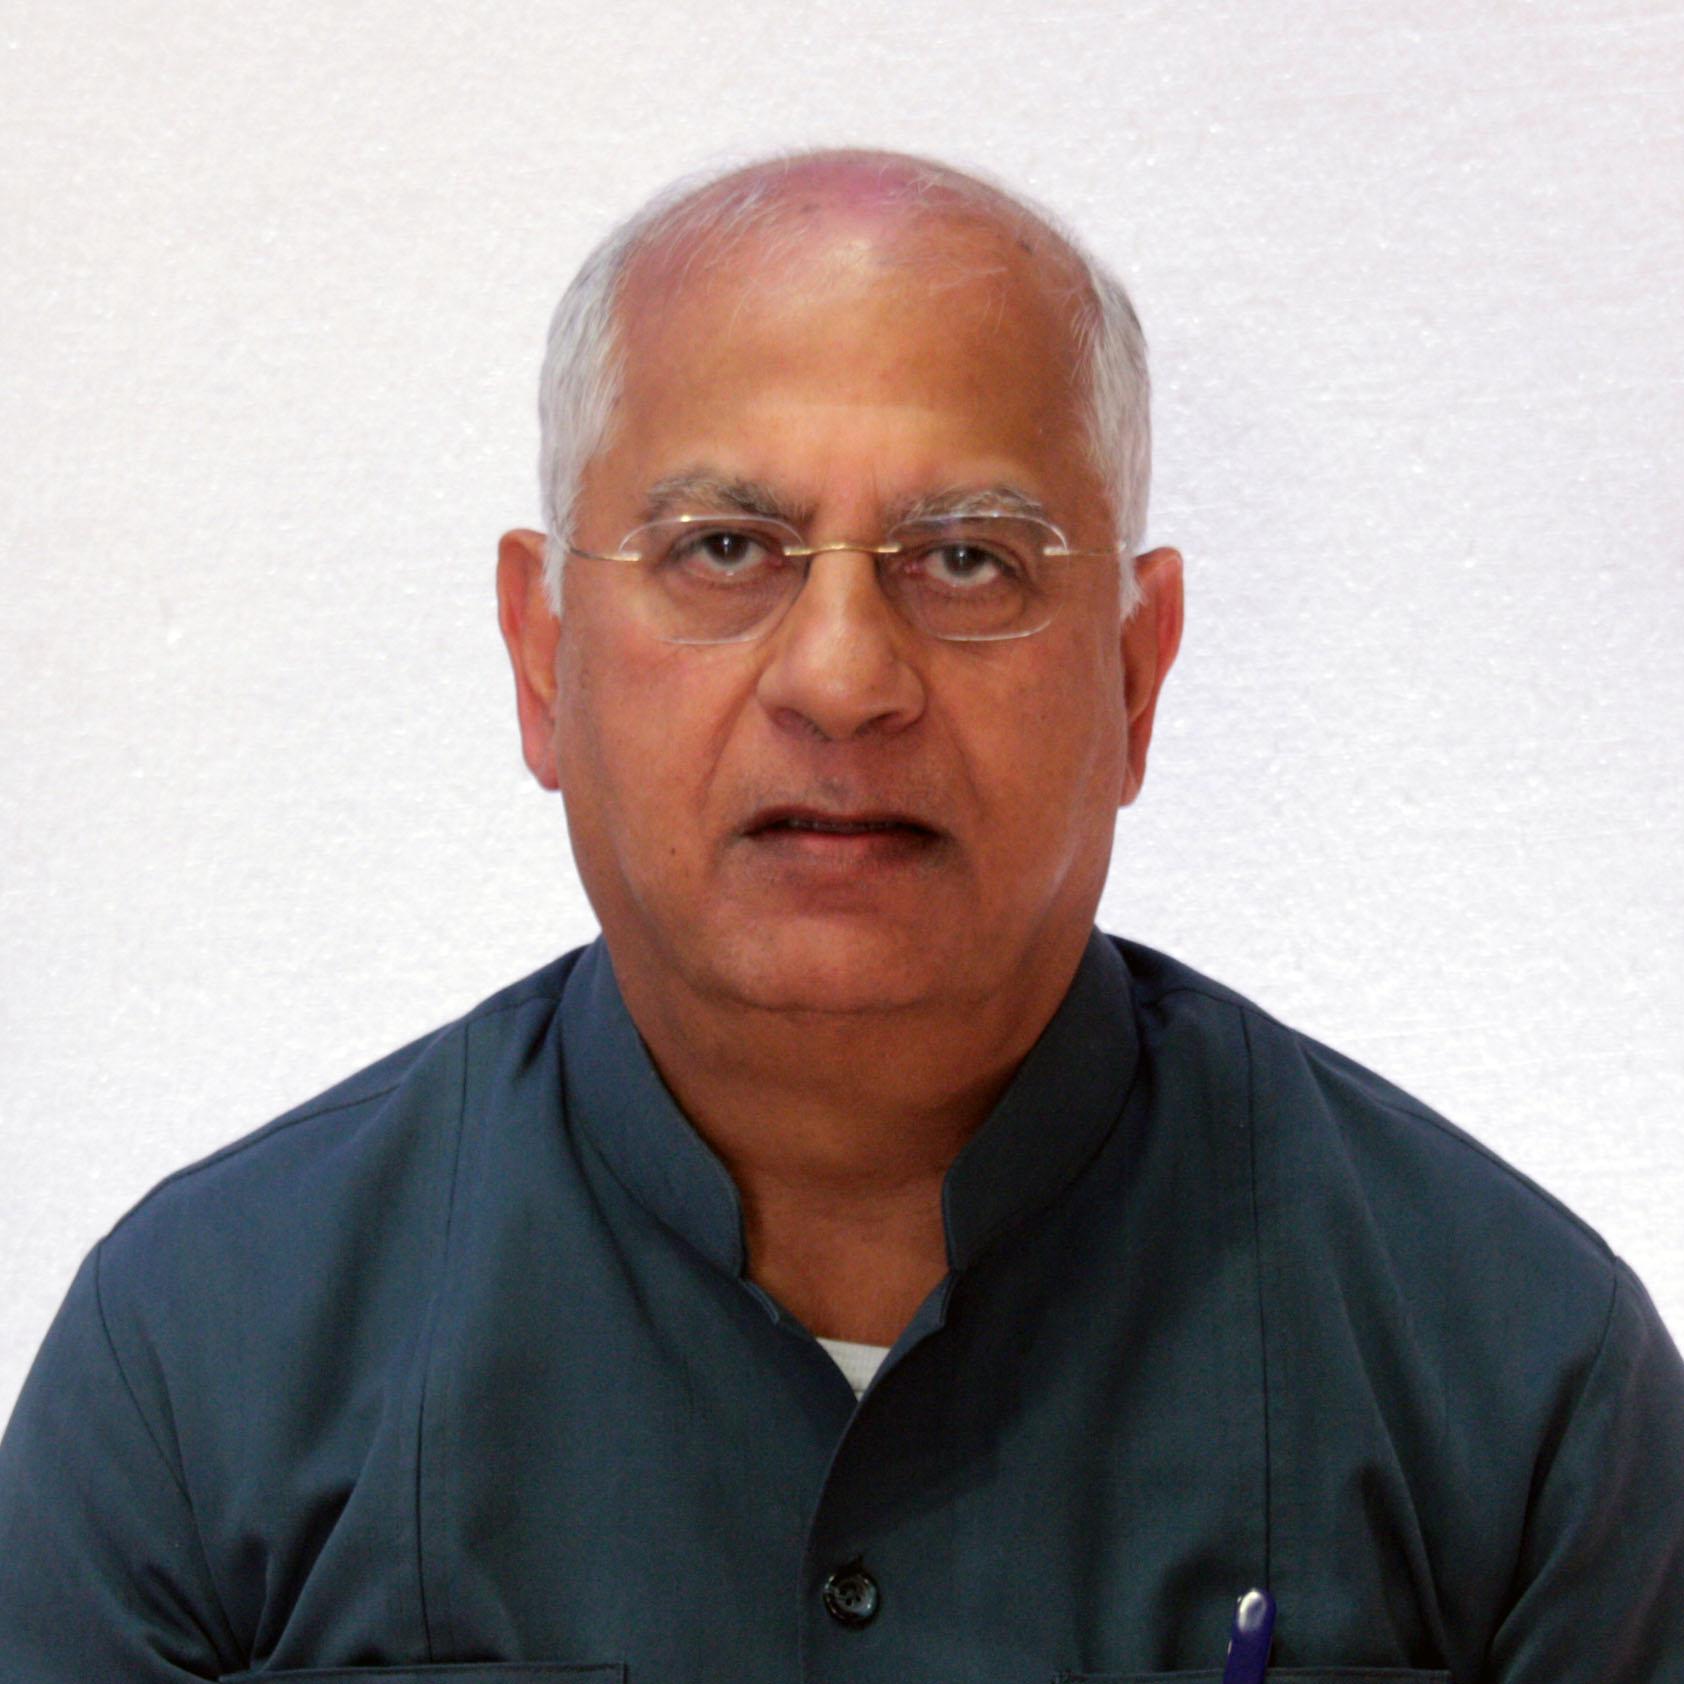 Dr. Amrit Bhatia